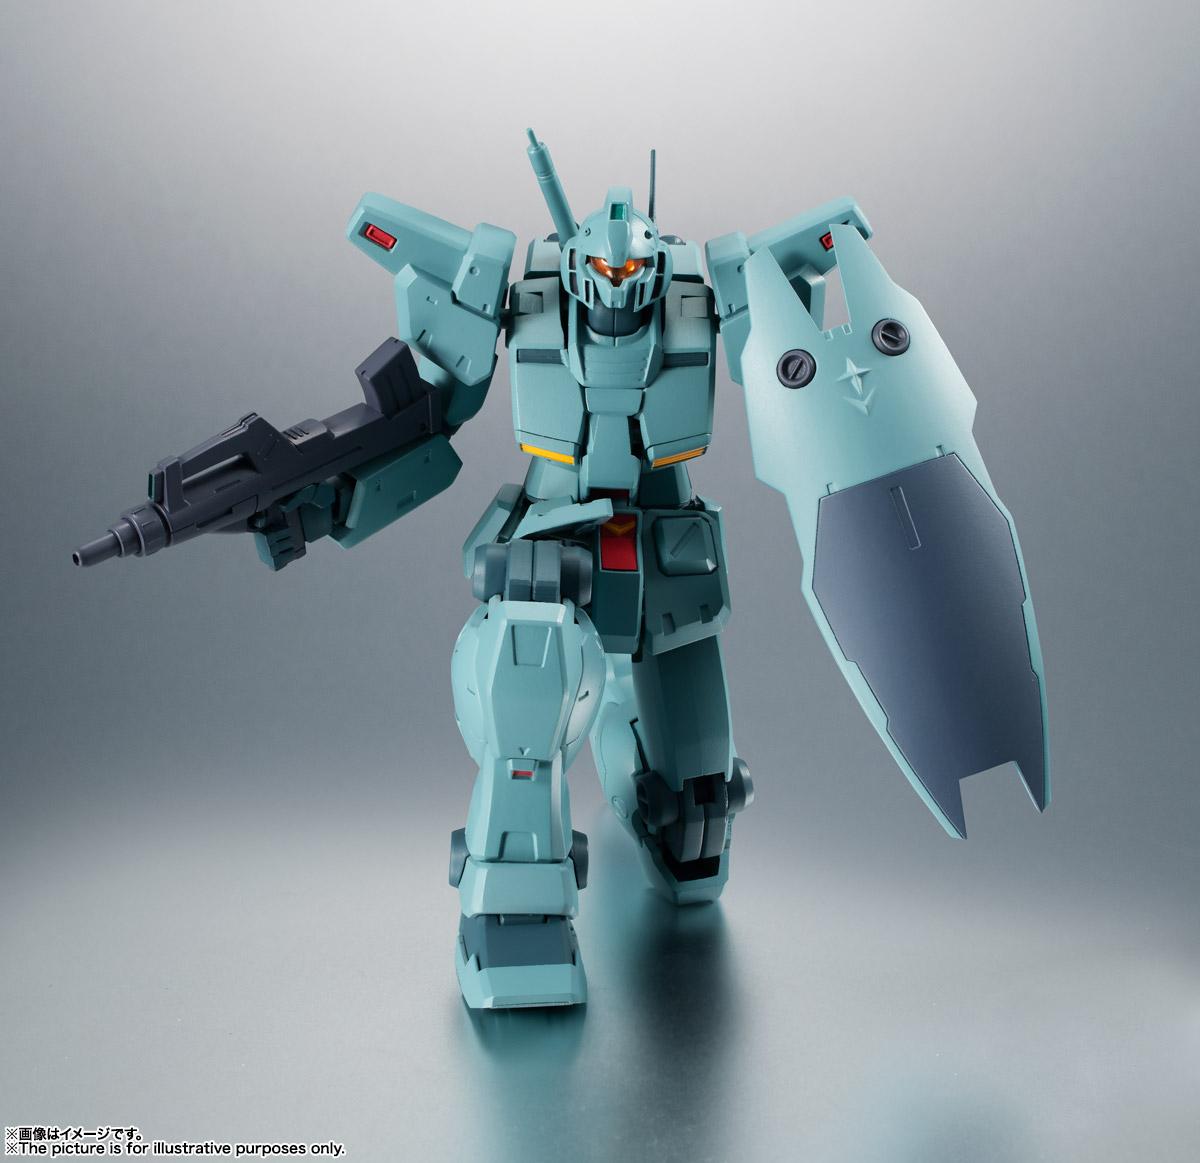 ROBOT魂〈SIDE MS〉『RGM-79N ジム・カスタム ver. A.N.I.M.E.』ガンダム0083 可動フィギュア-009